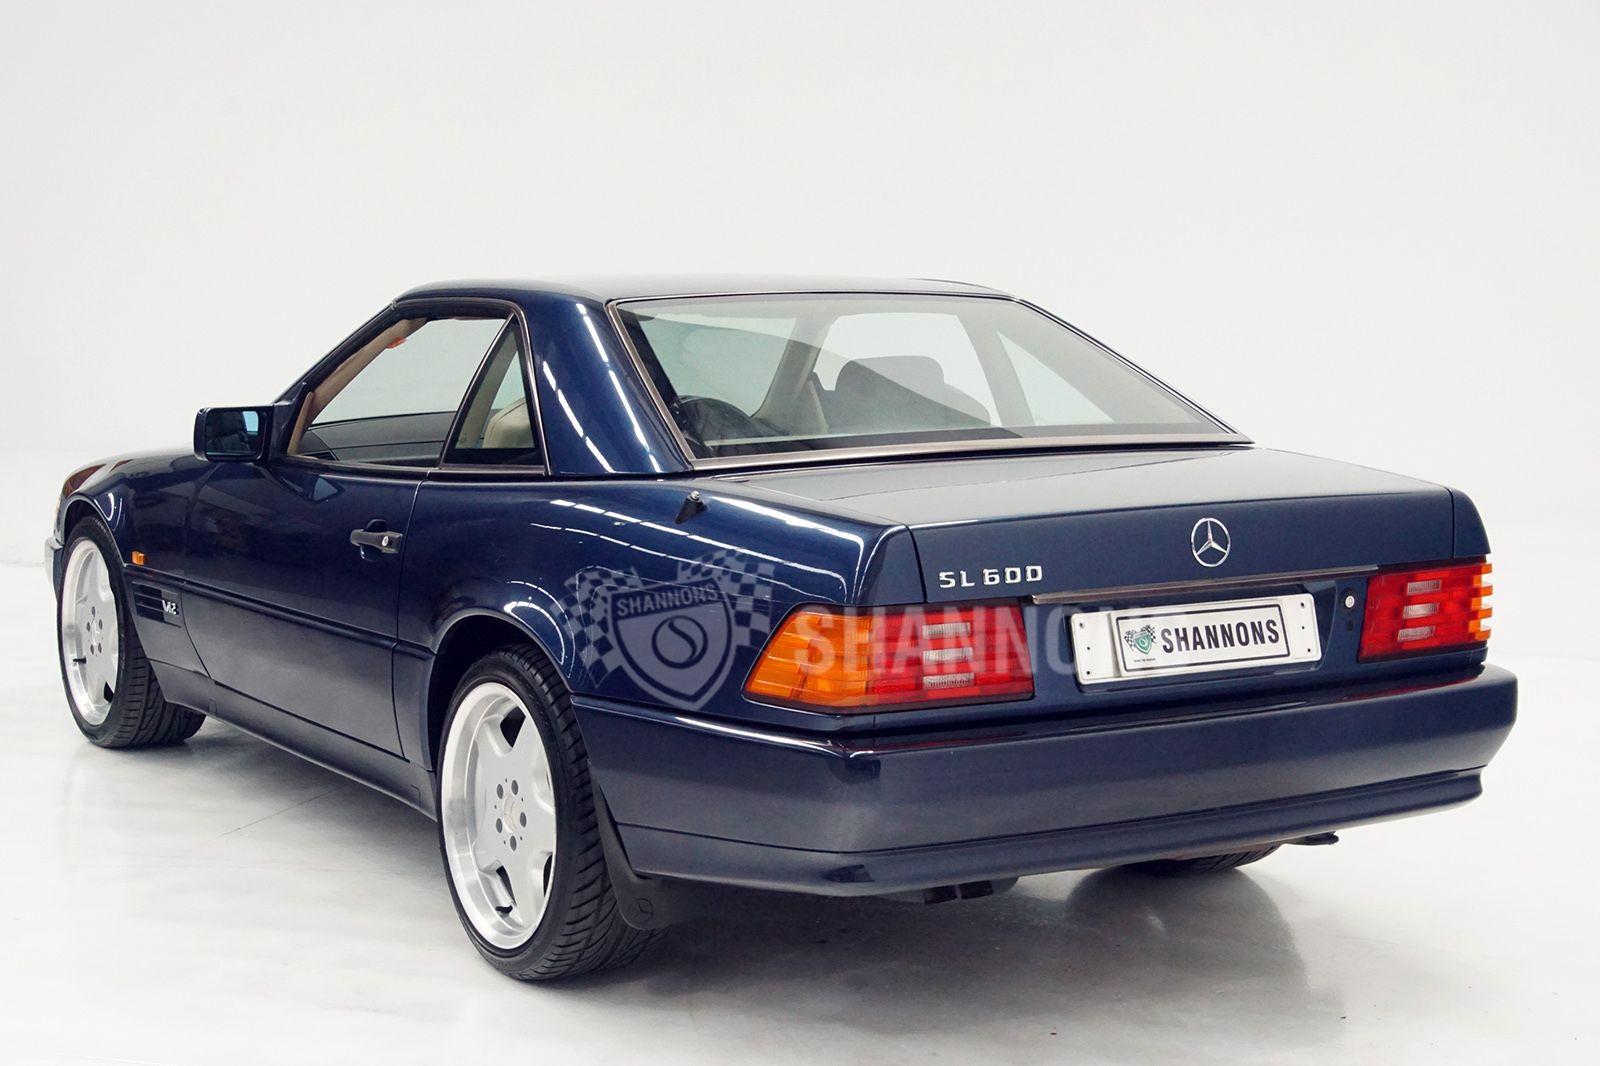 Mercedes-Benz SL600 Convertible